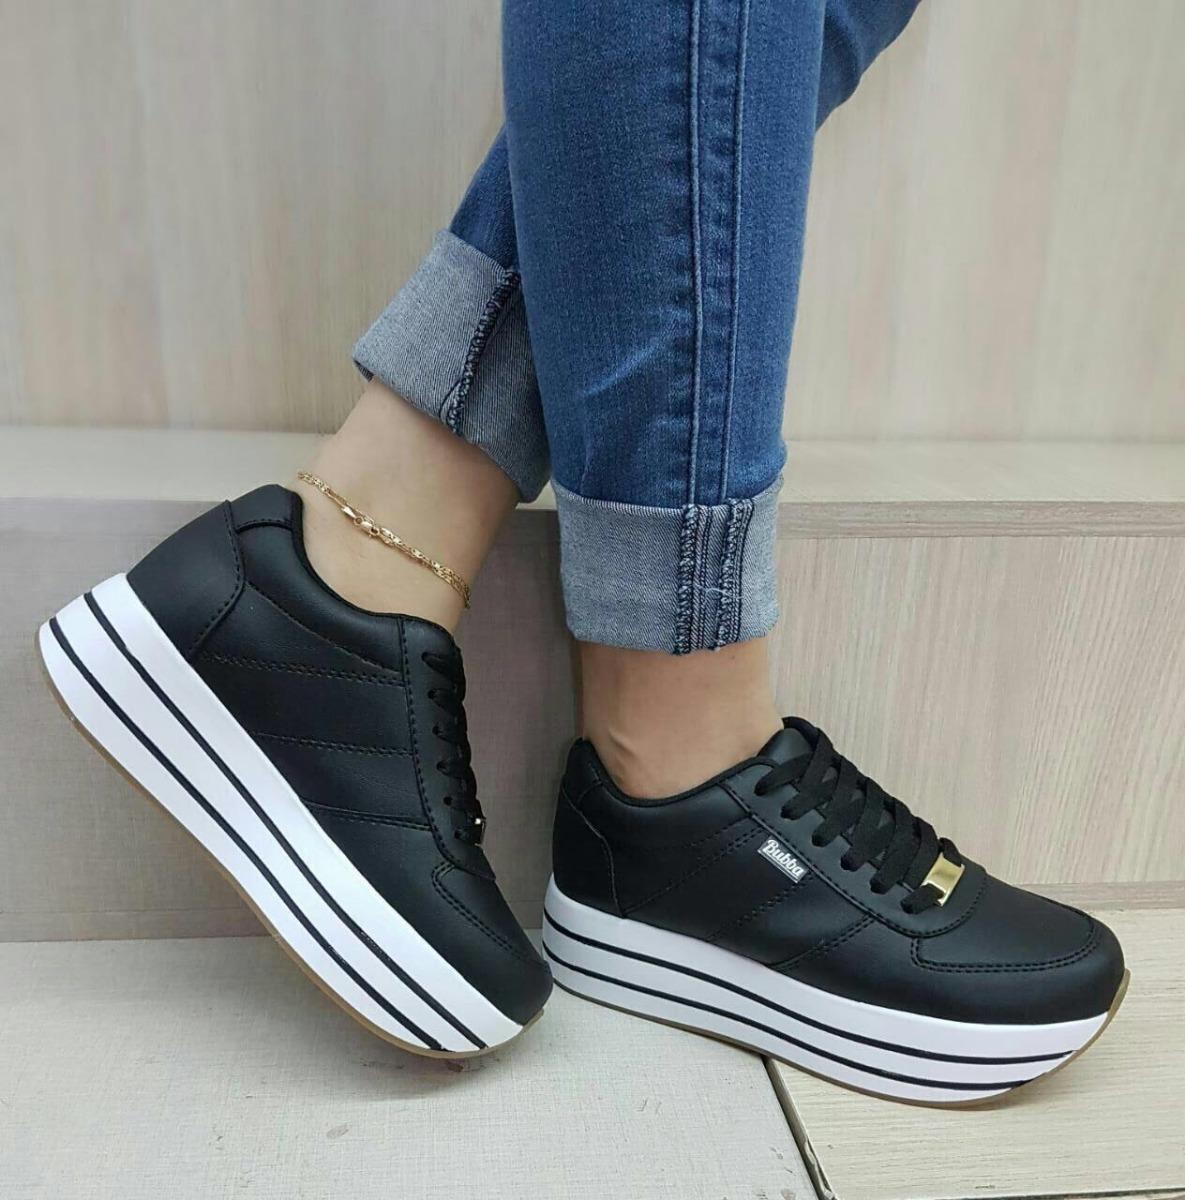 ff52939382 teni zapatos negros doble piso suela alta dama moda mujer. Cargando zoom.